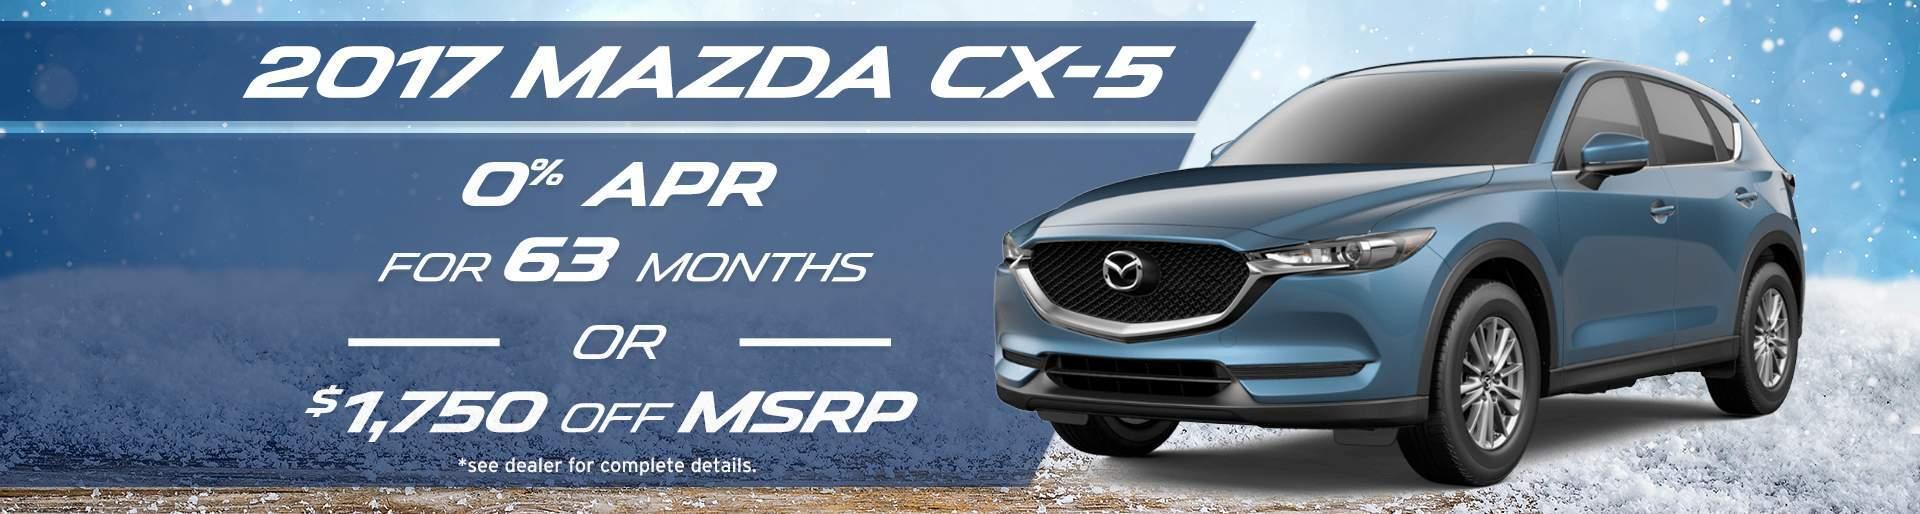 Mazda Dealership Midland TX Used Cars Mazda Of Midland - Mazda dealers texas